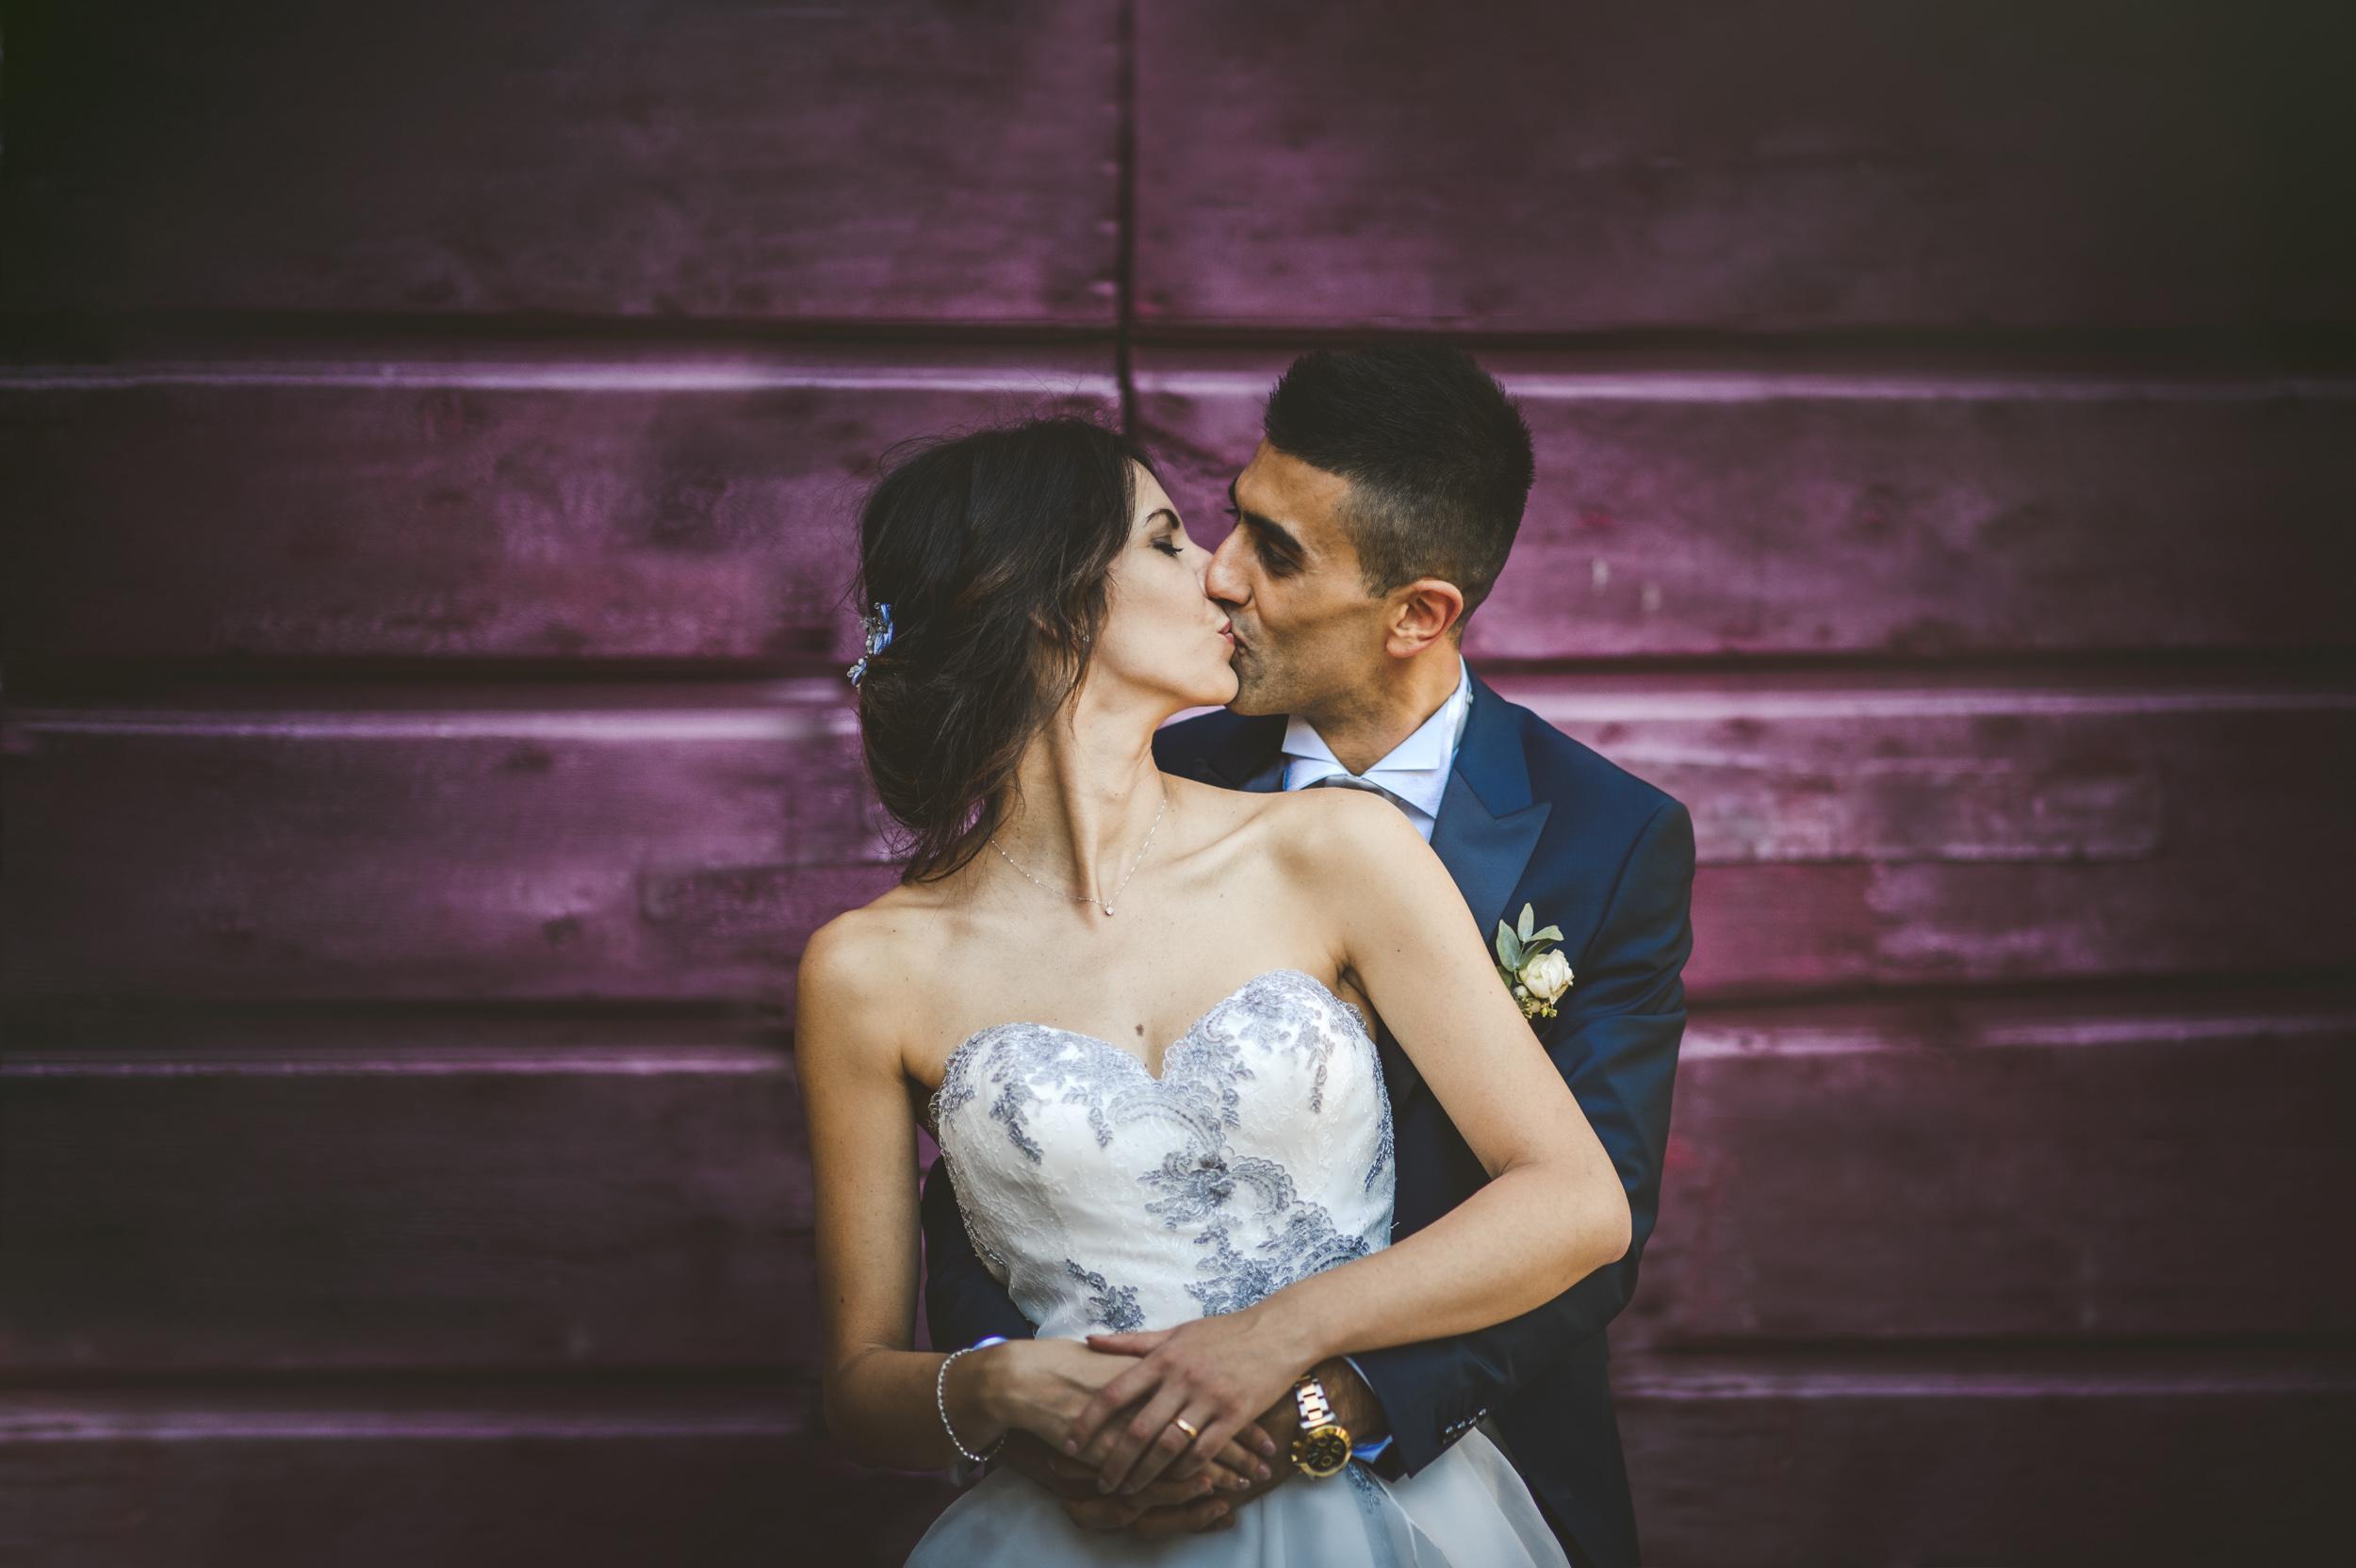 Elio & Ilenia - Matrimonio presso Castello di San Fabiano, Siena, Toscana, 29/9/2018